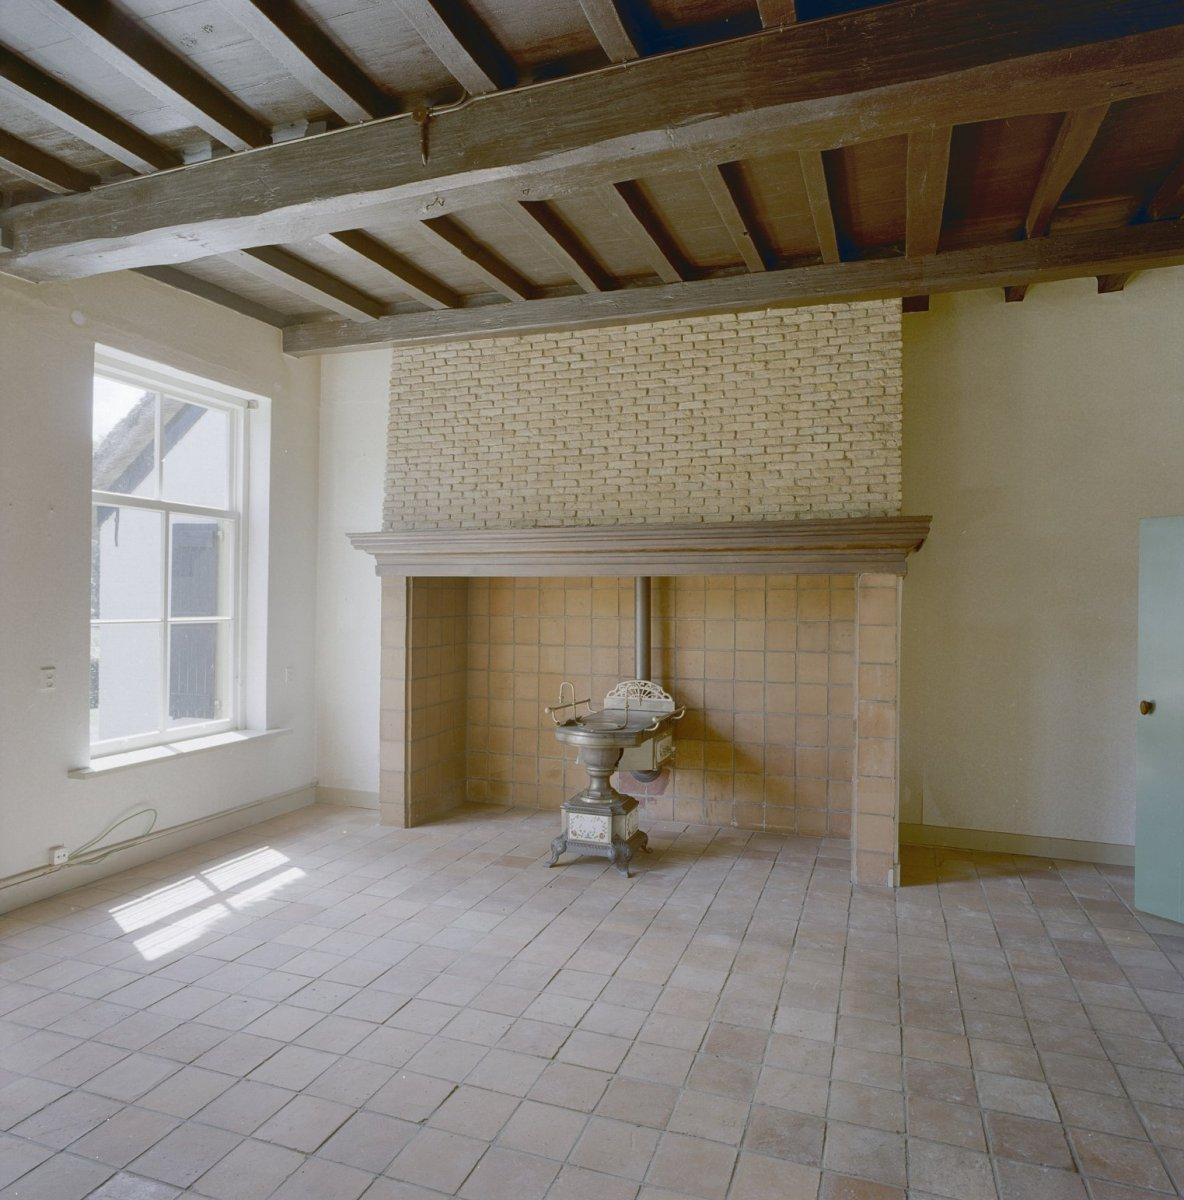 File interieur woonkamer met schouw en balkenplafond for Interieur woonkamer